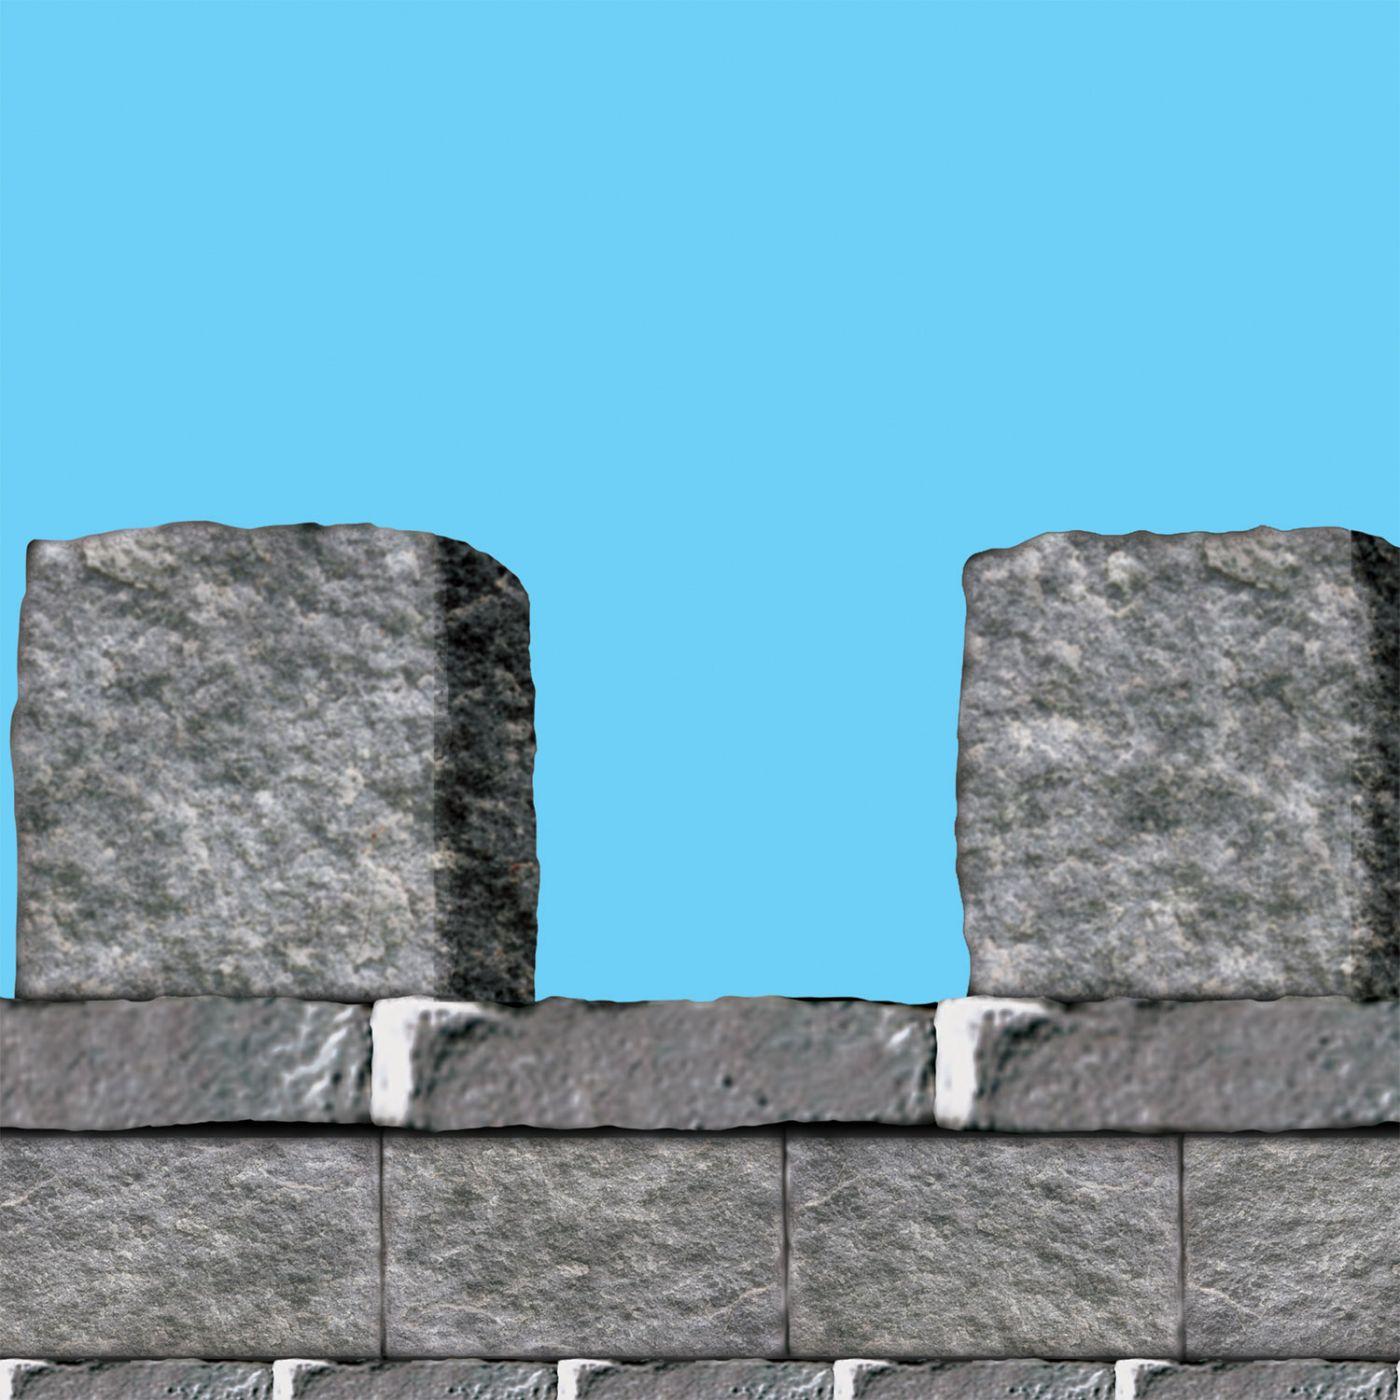 Stone Wall Border (6) image